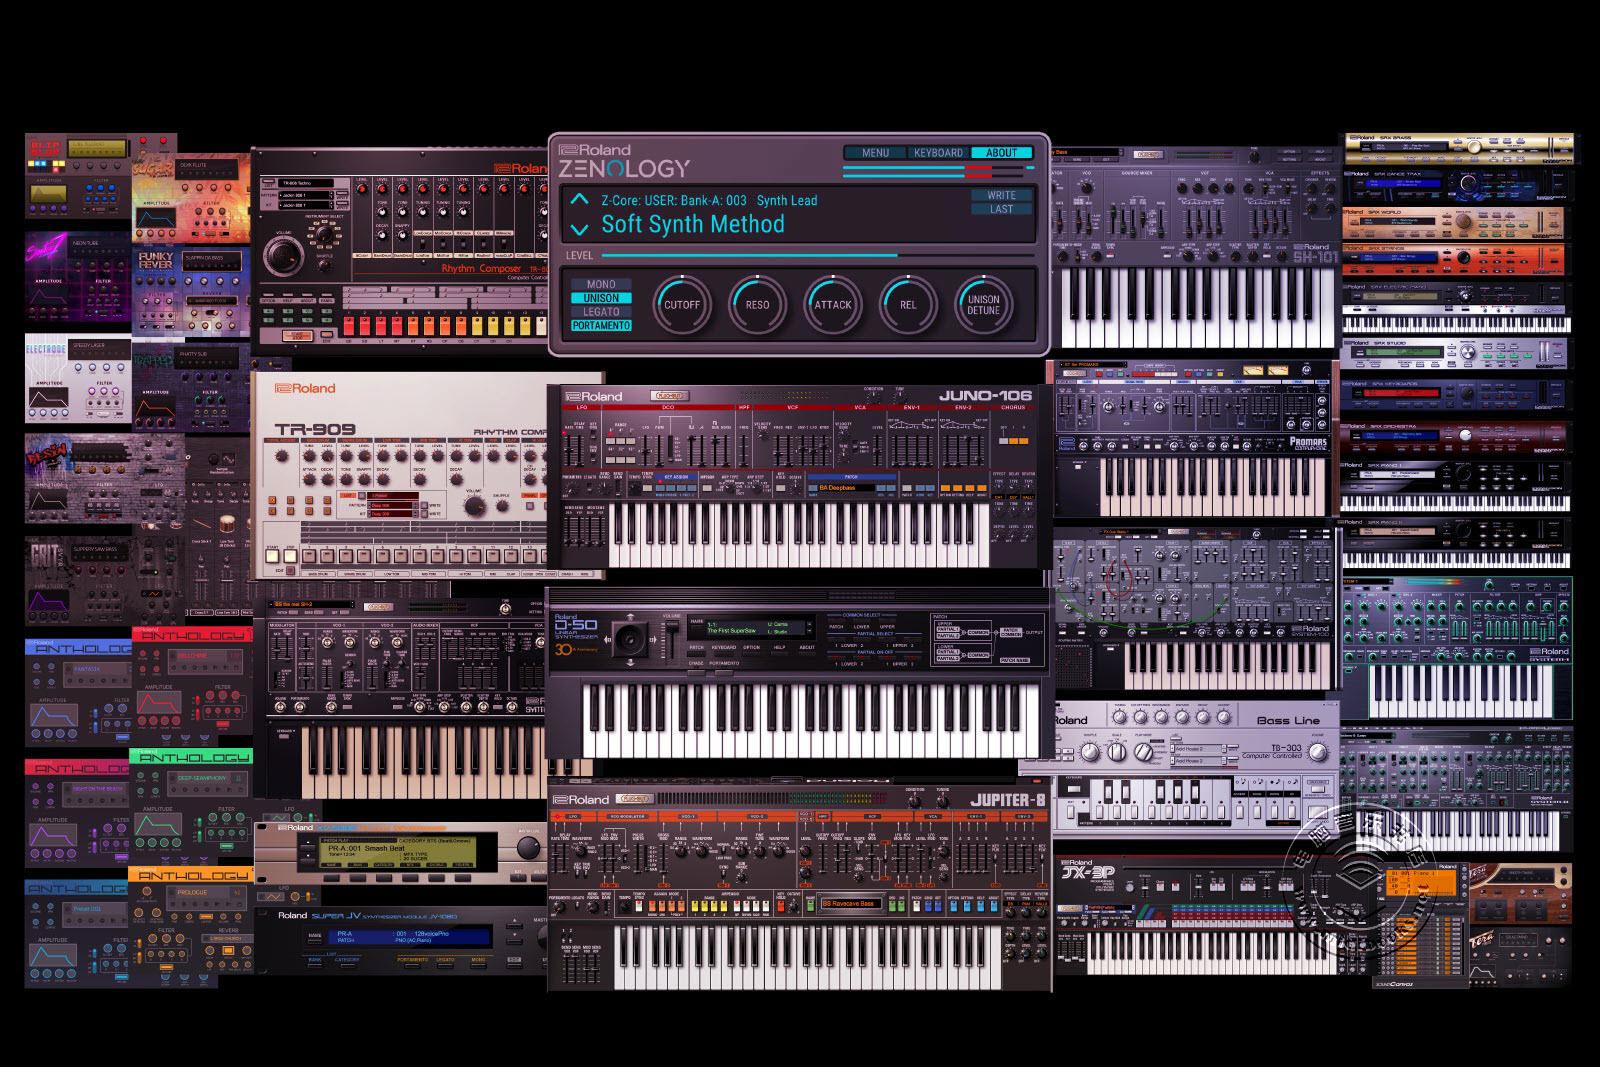 Roland Cloud(罗兰云)乐器开始了迄今为止最大规模的扩充